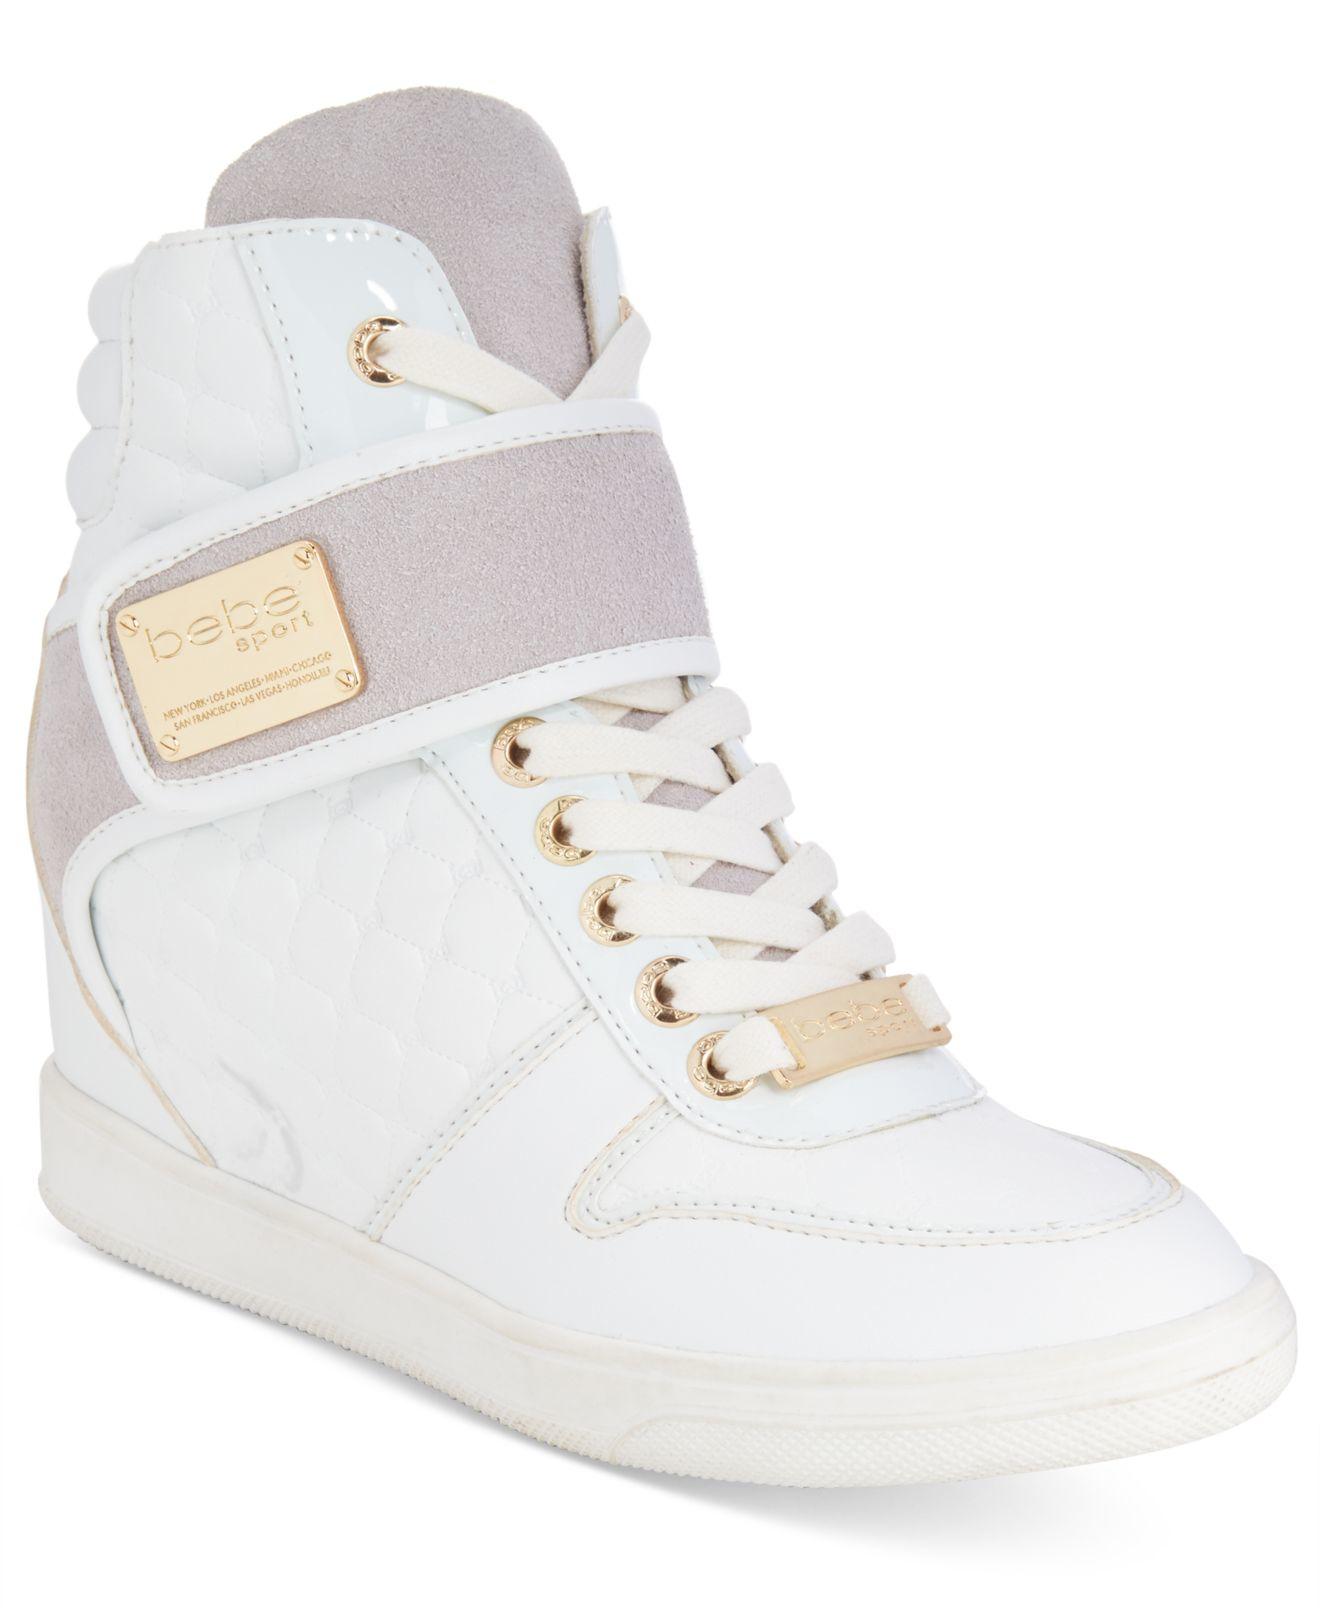 d3d6fc50171 Lyst - Bebe Sport Colby Wedge Sneakers in White